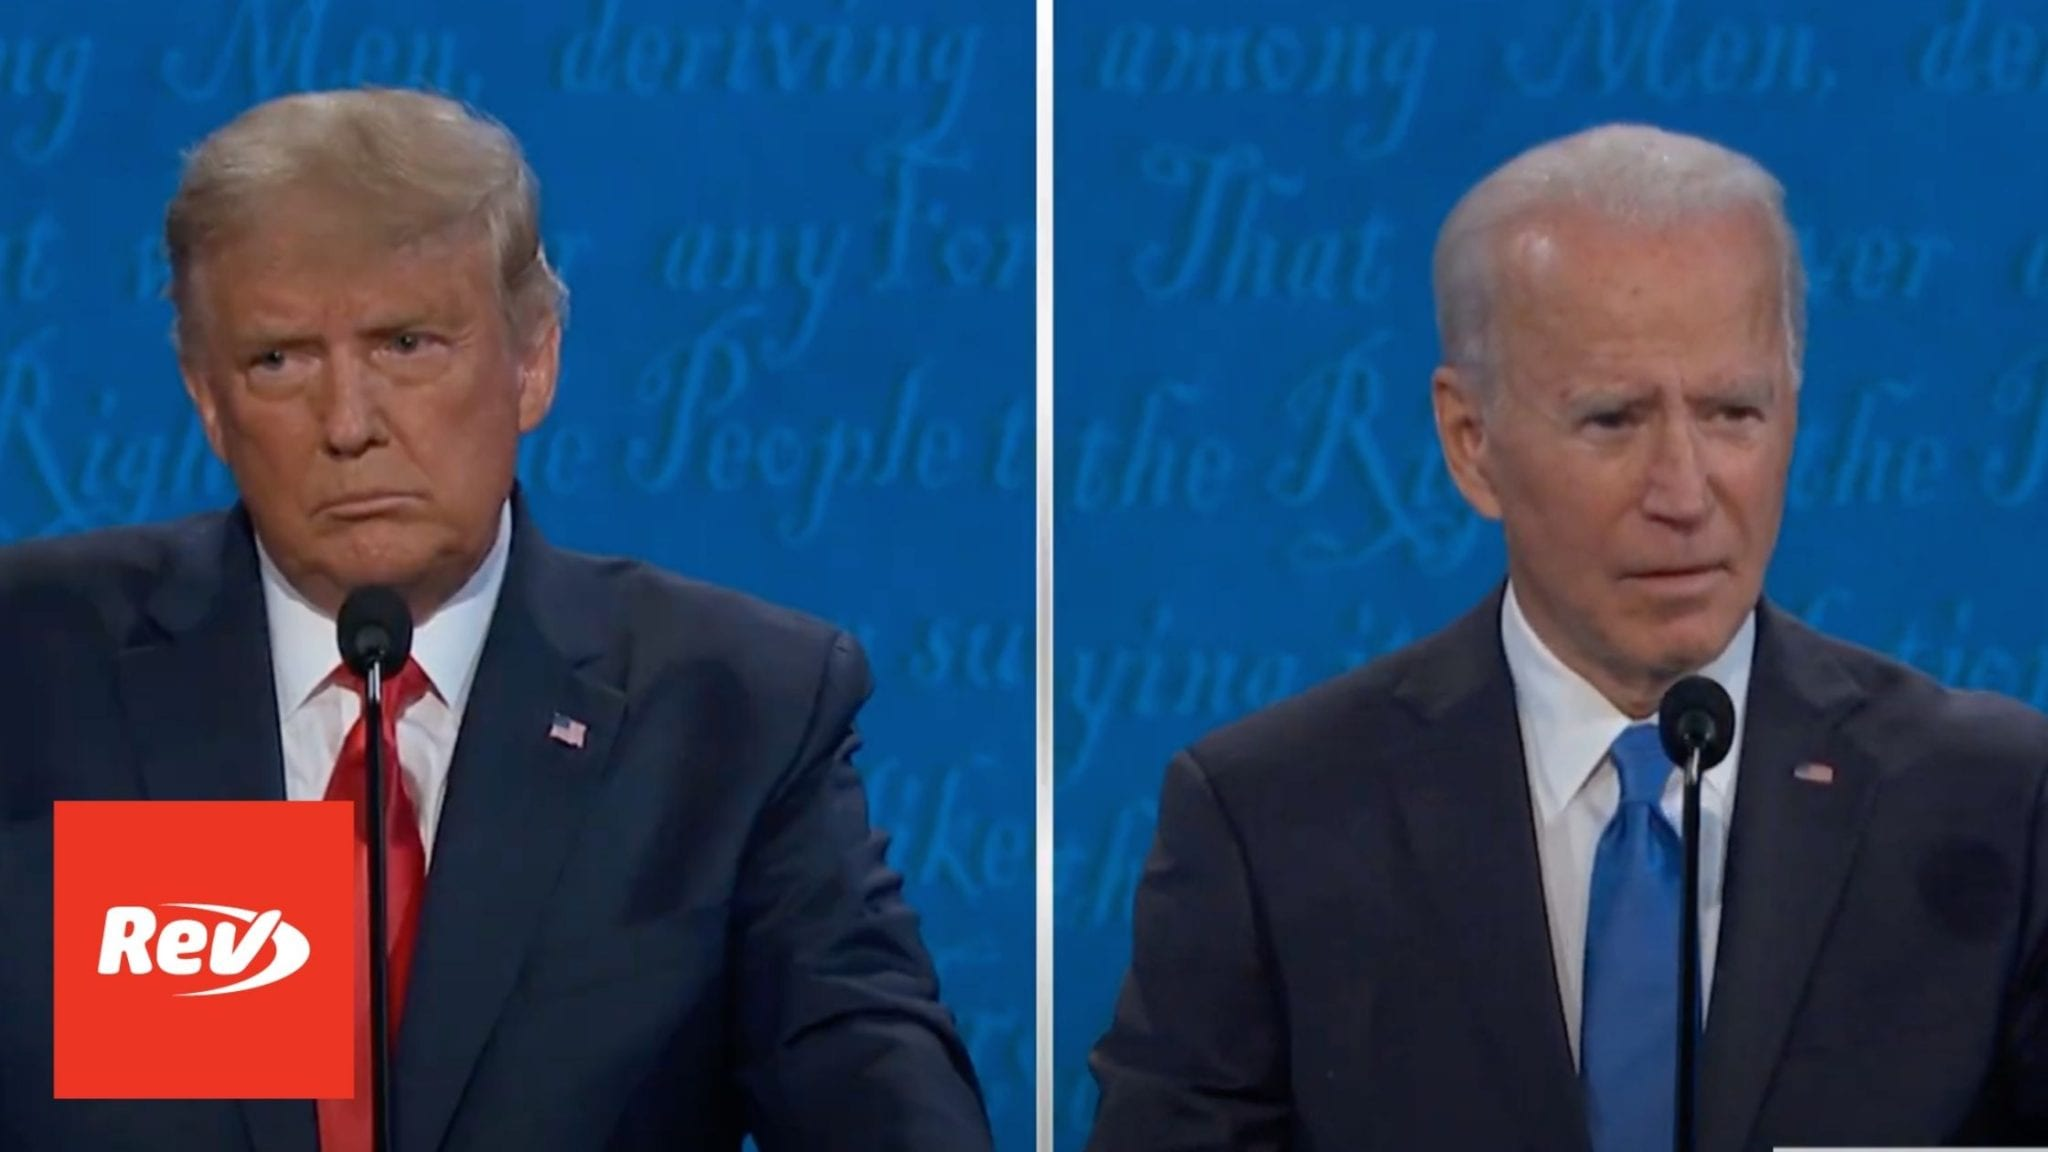 Donald Trump & Joe Biden 2nd Presidential Debate Transcript 2020